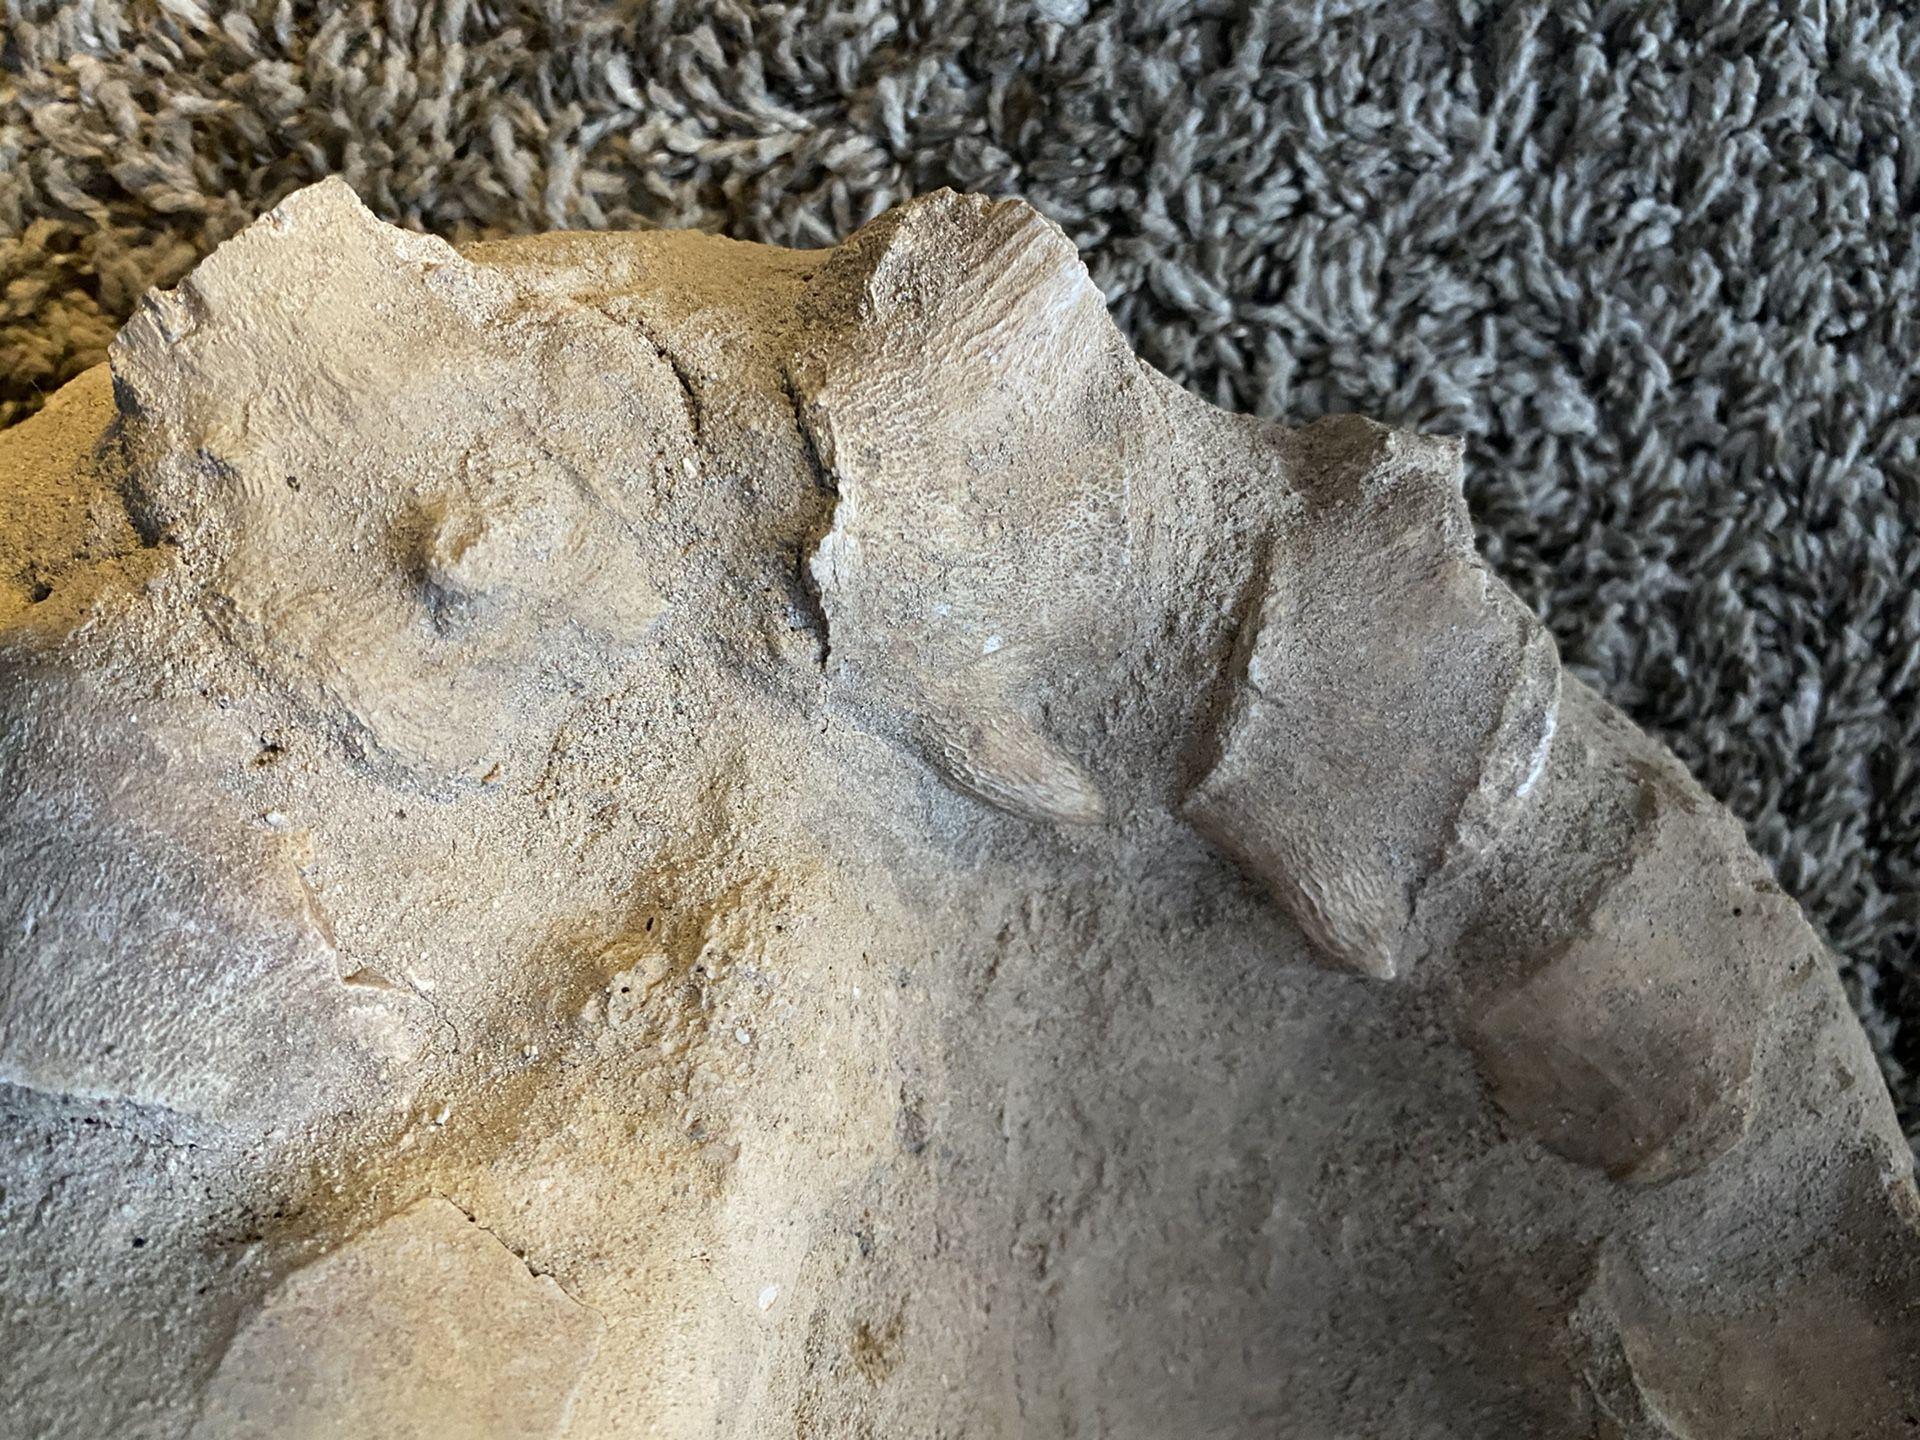 Alligator Fossil